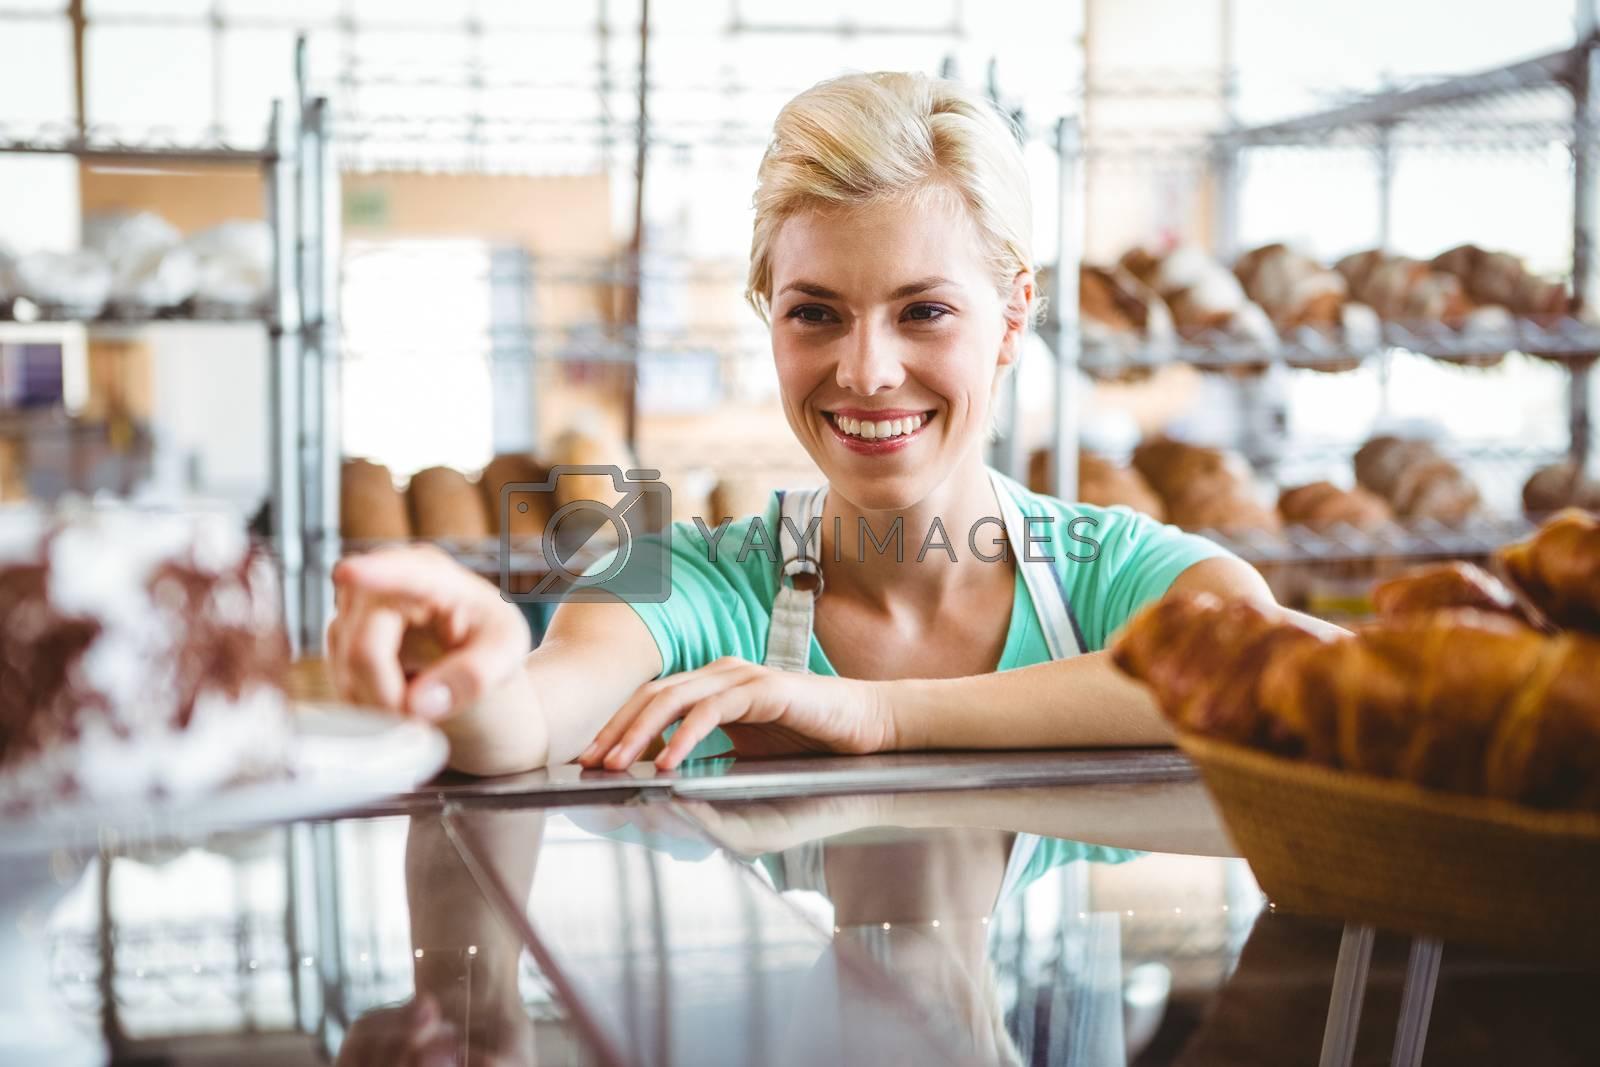 Royalty free image of Smiling waitress posing next basket of bread by Wavebreakmedia